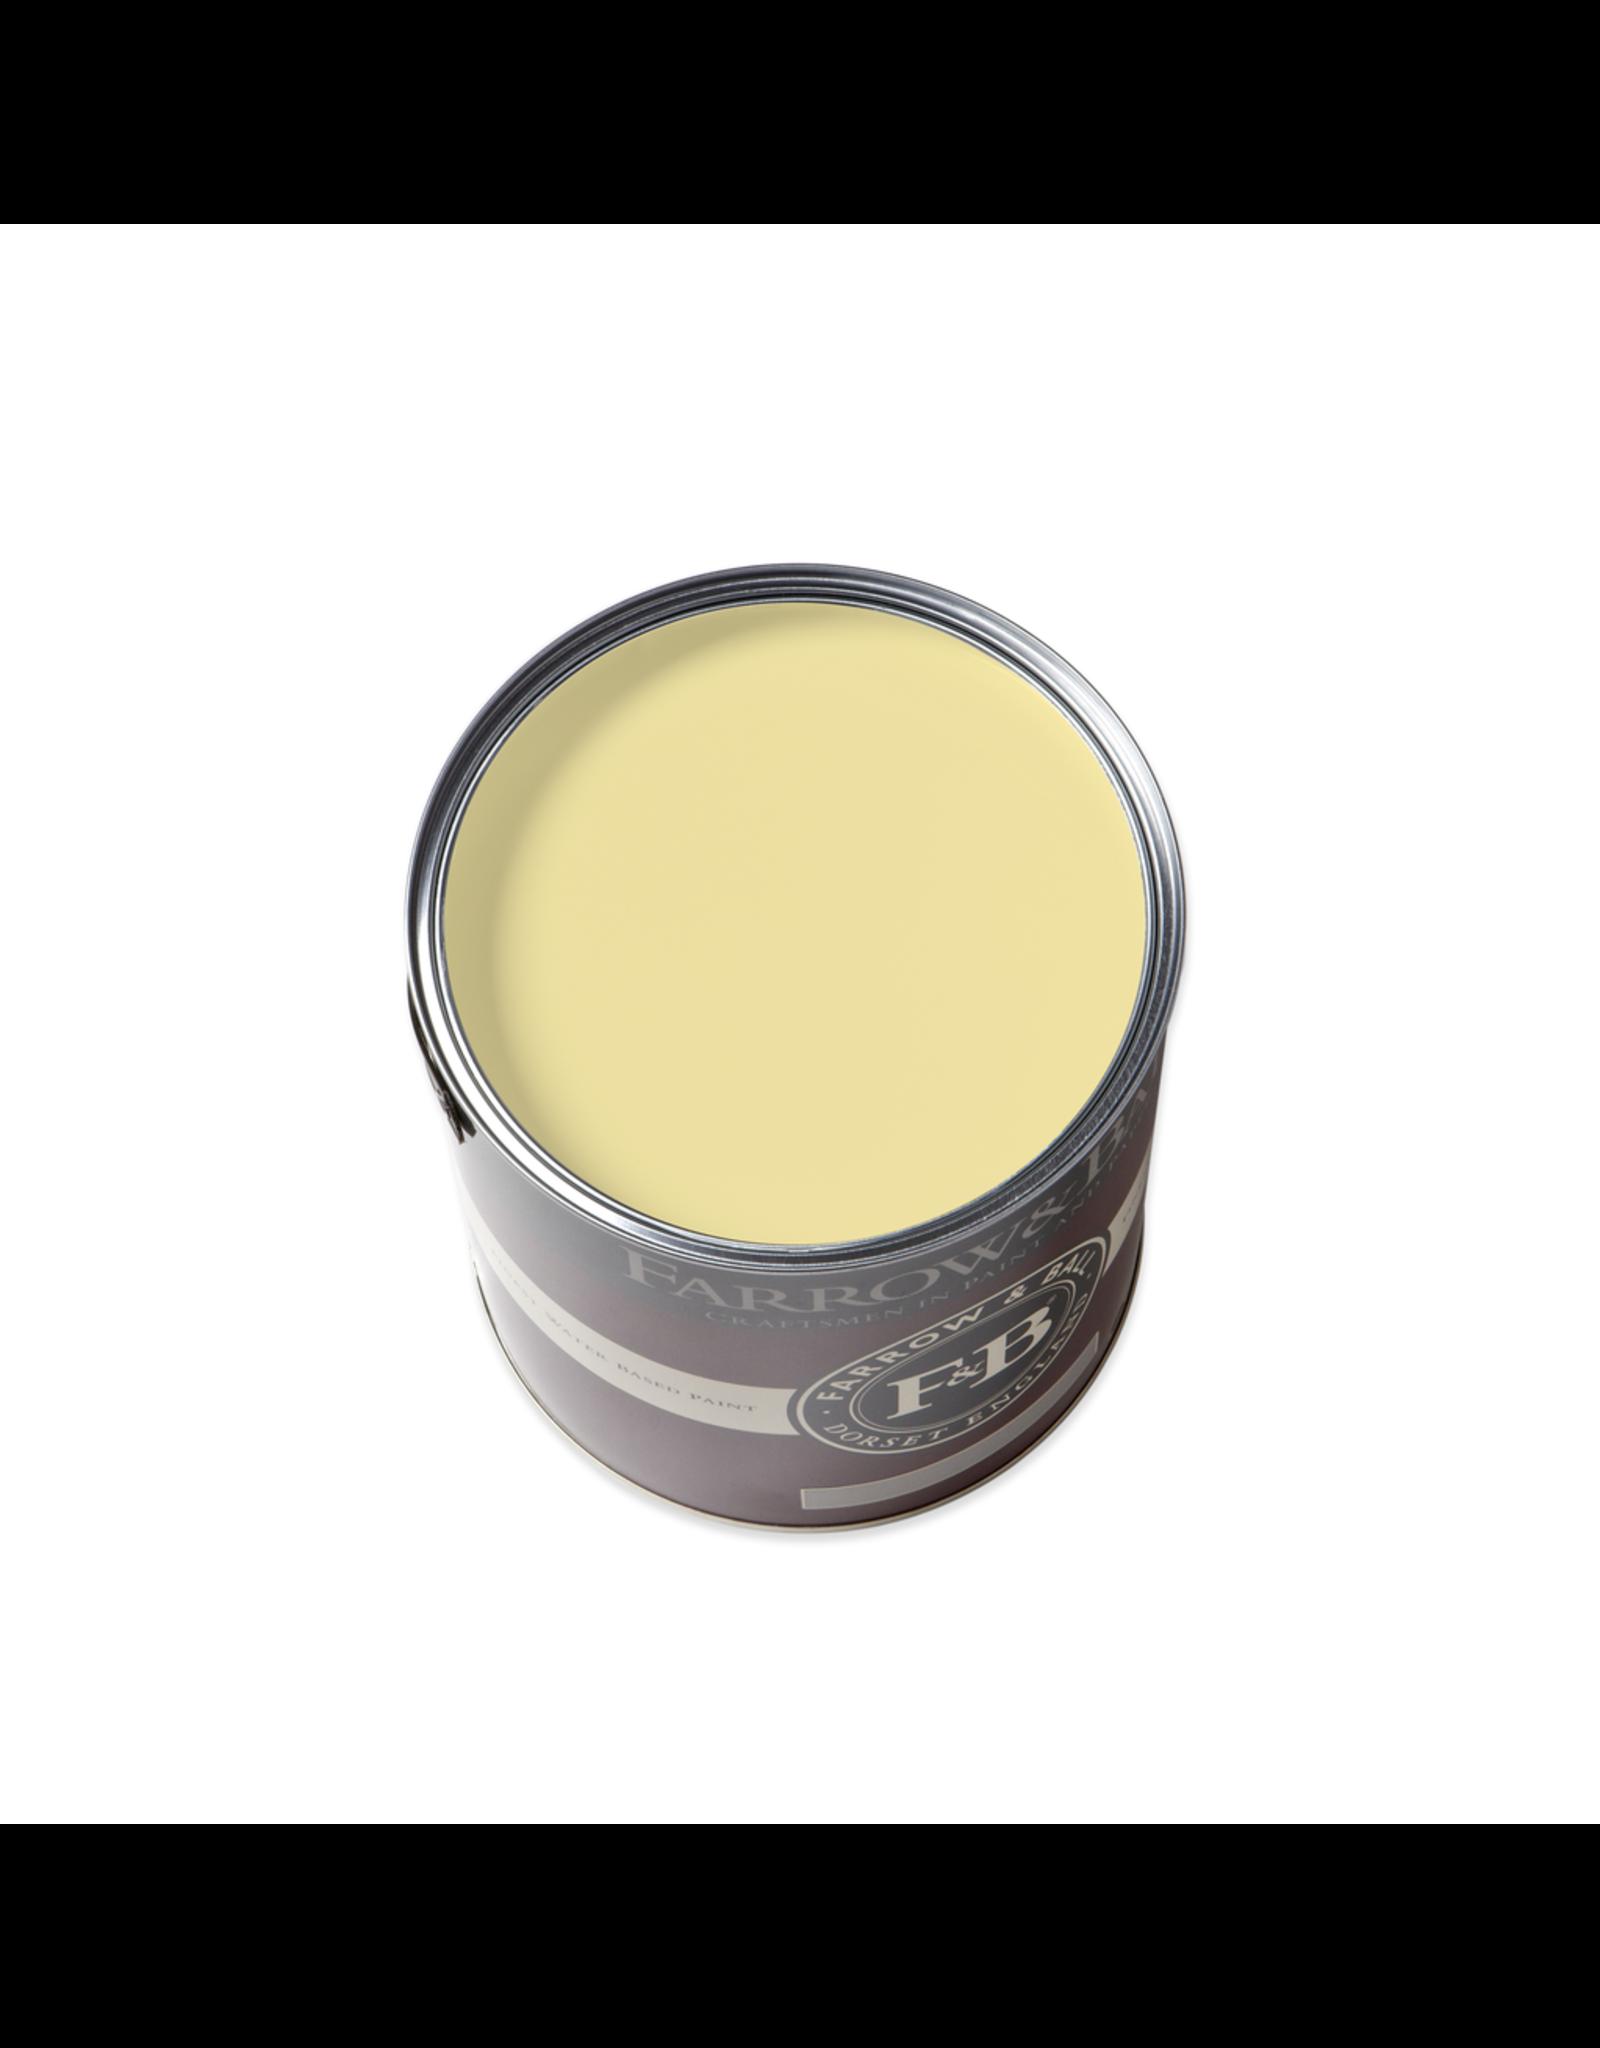 Farrow and Ball Gallon Modern Emulsion Dayroom Yellow No. 233